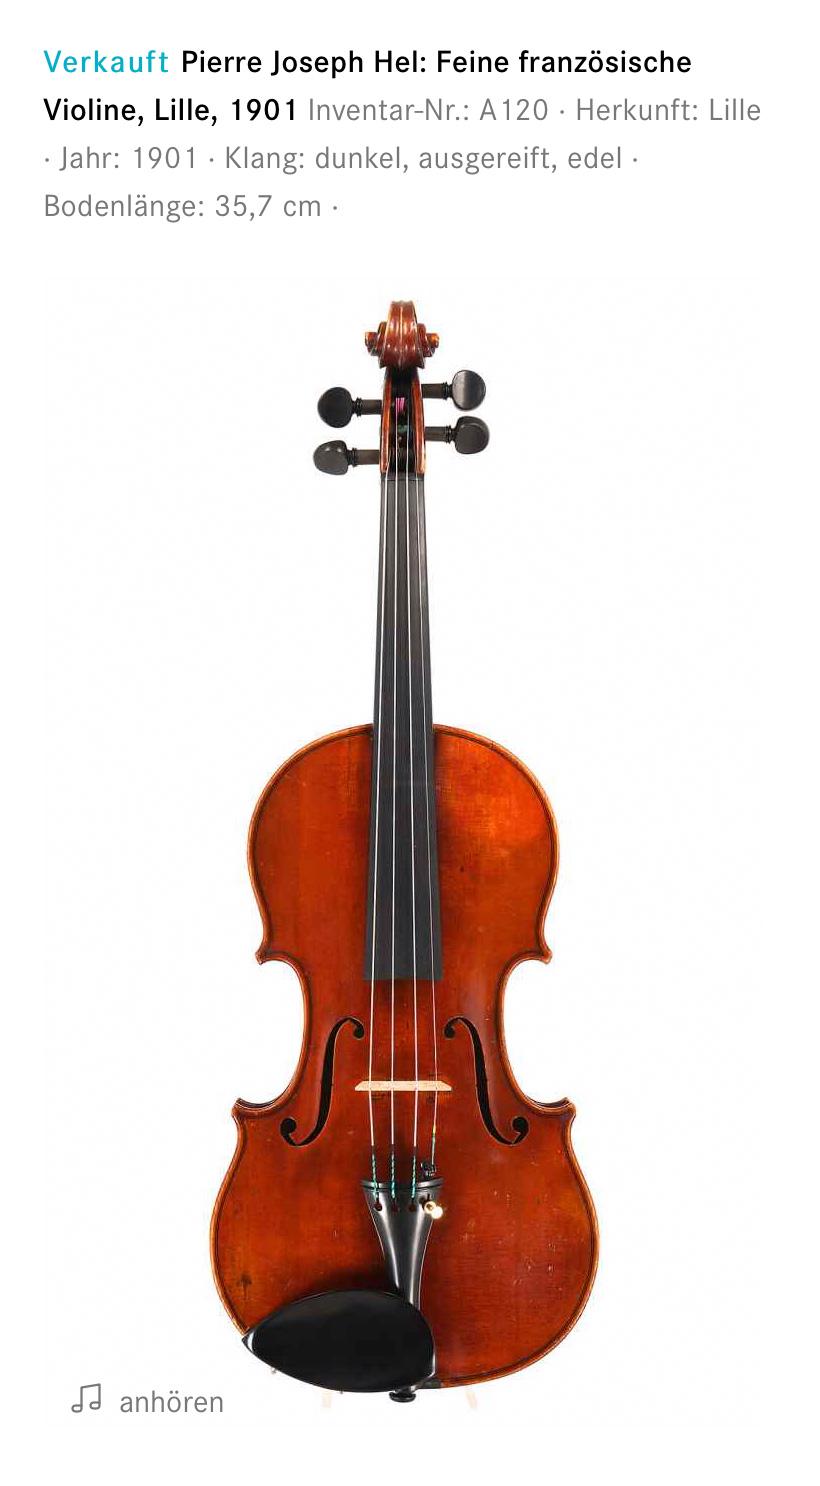 Piere Joseph Hel Violine